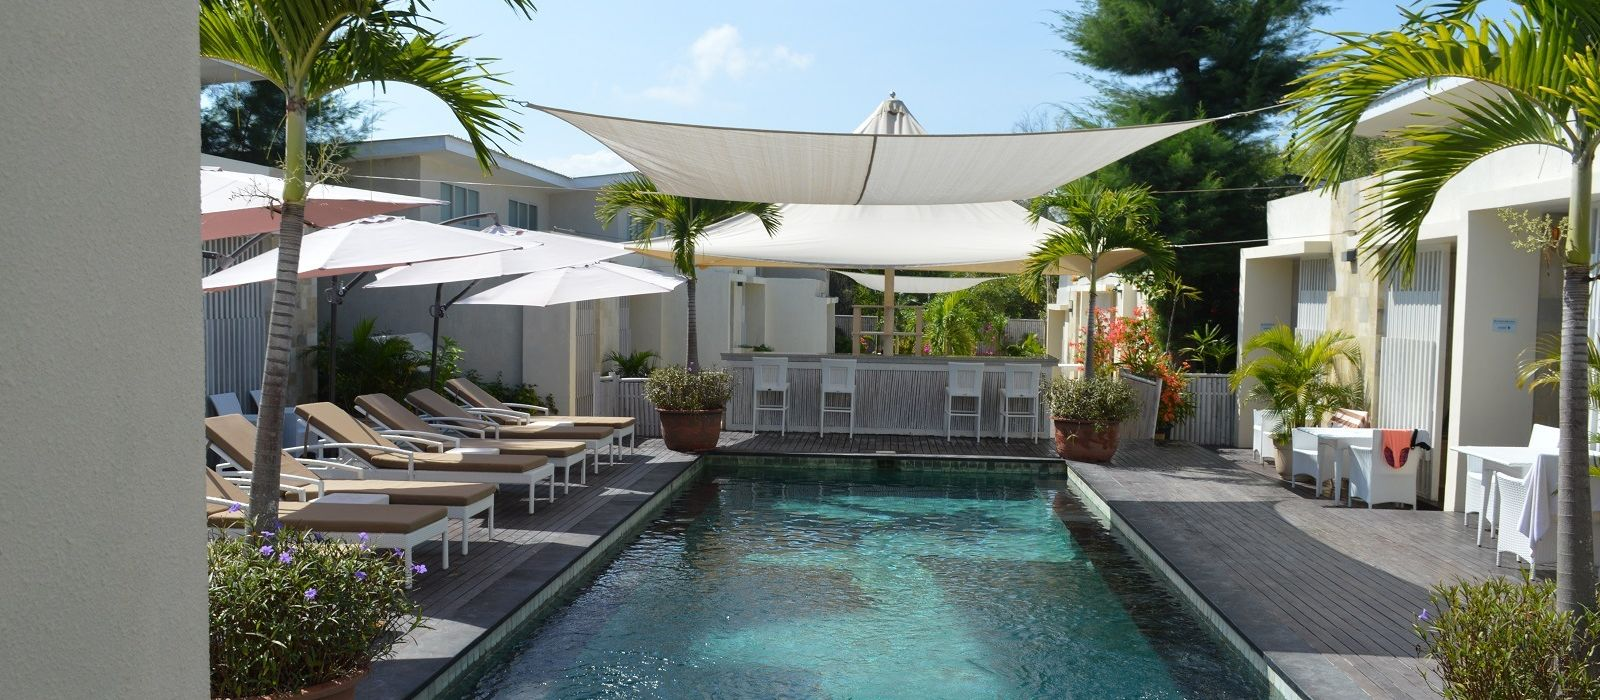 Hotel Mahamaya Boutique Resort Indonesia